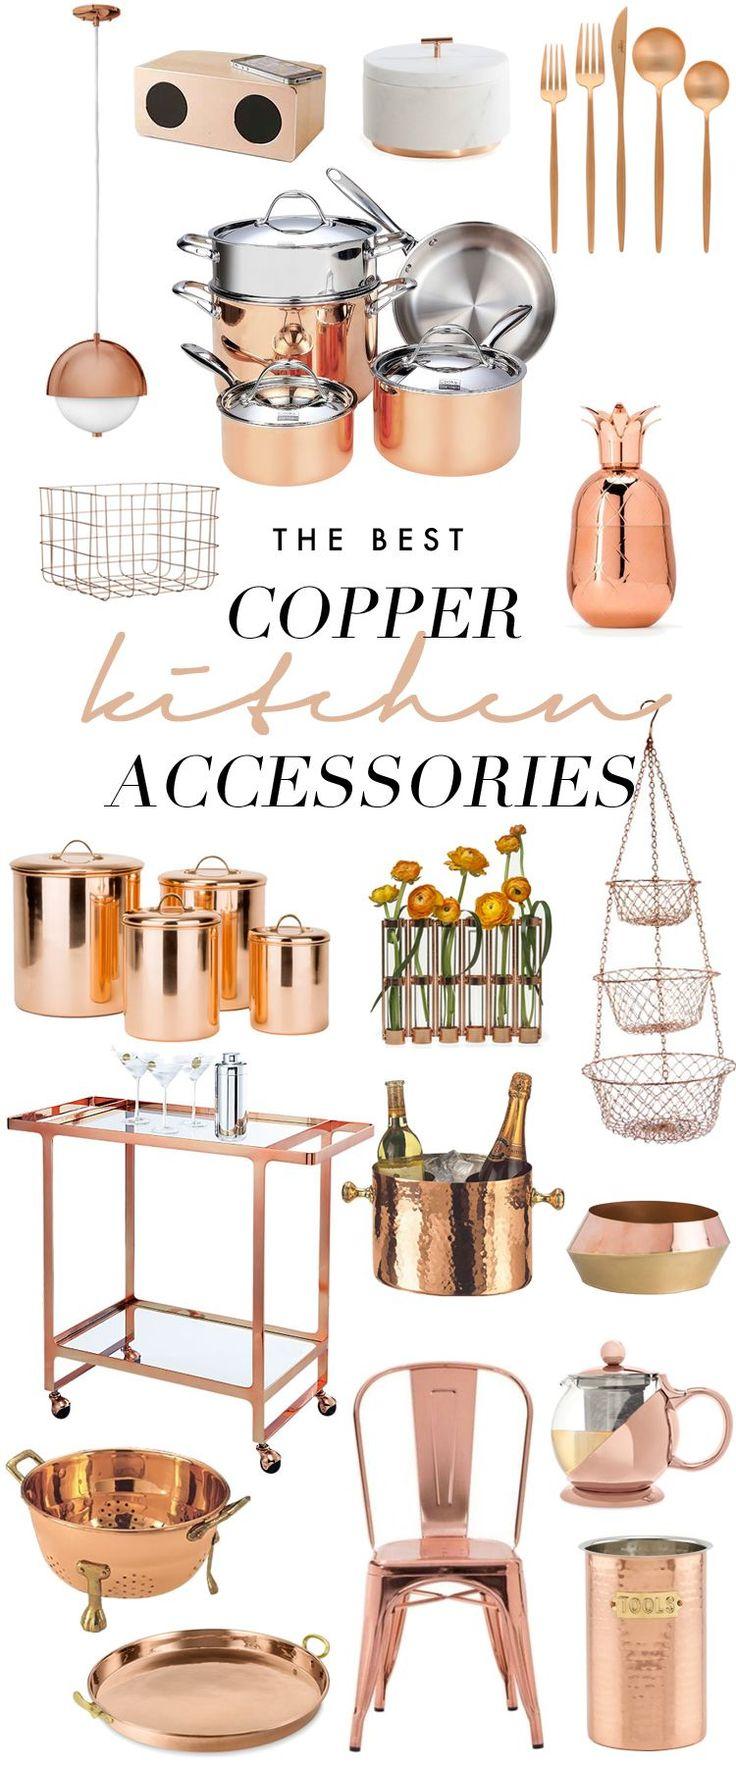 Farmhouse Decorating Ideas. The Best Copper Kitchen Accessories: http://www.sarahsarna.com/copper-kitchen-accents/